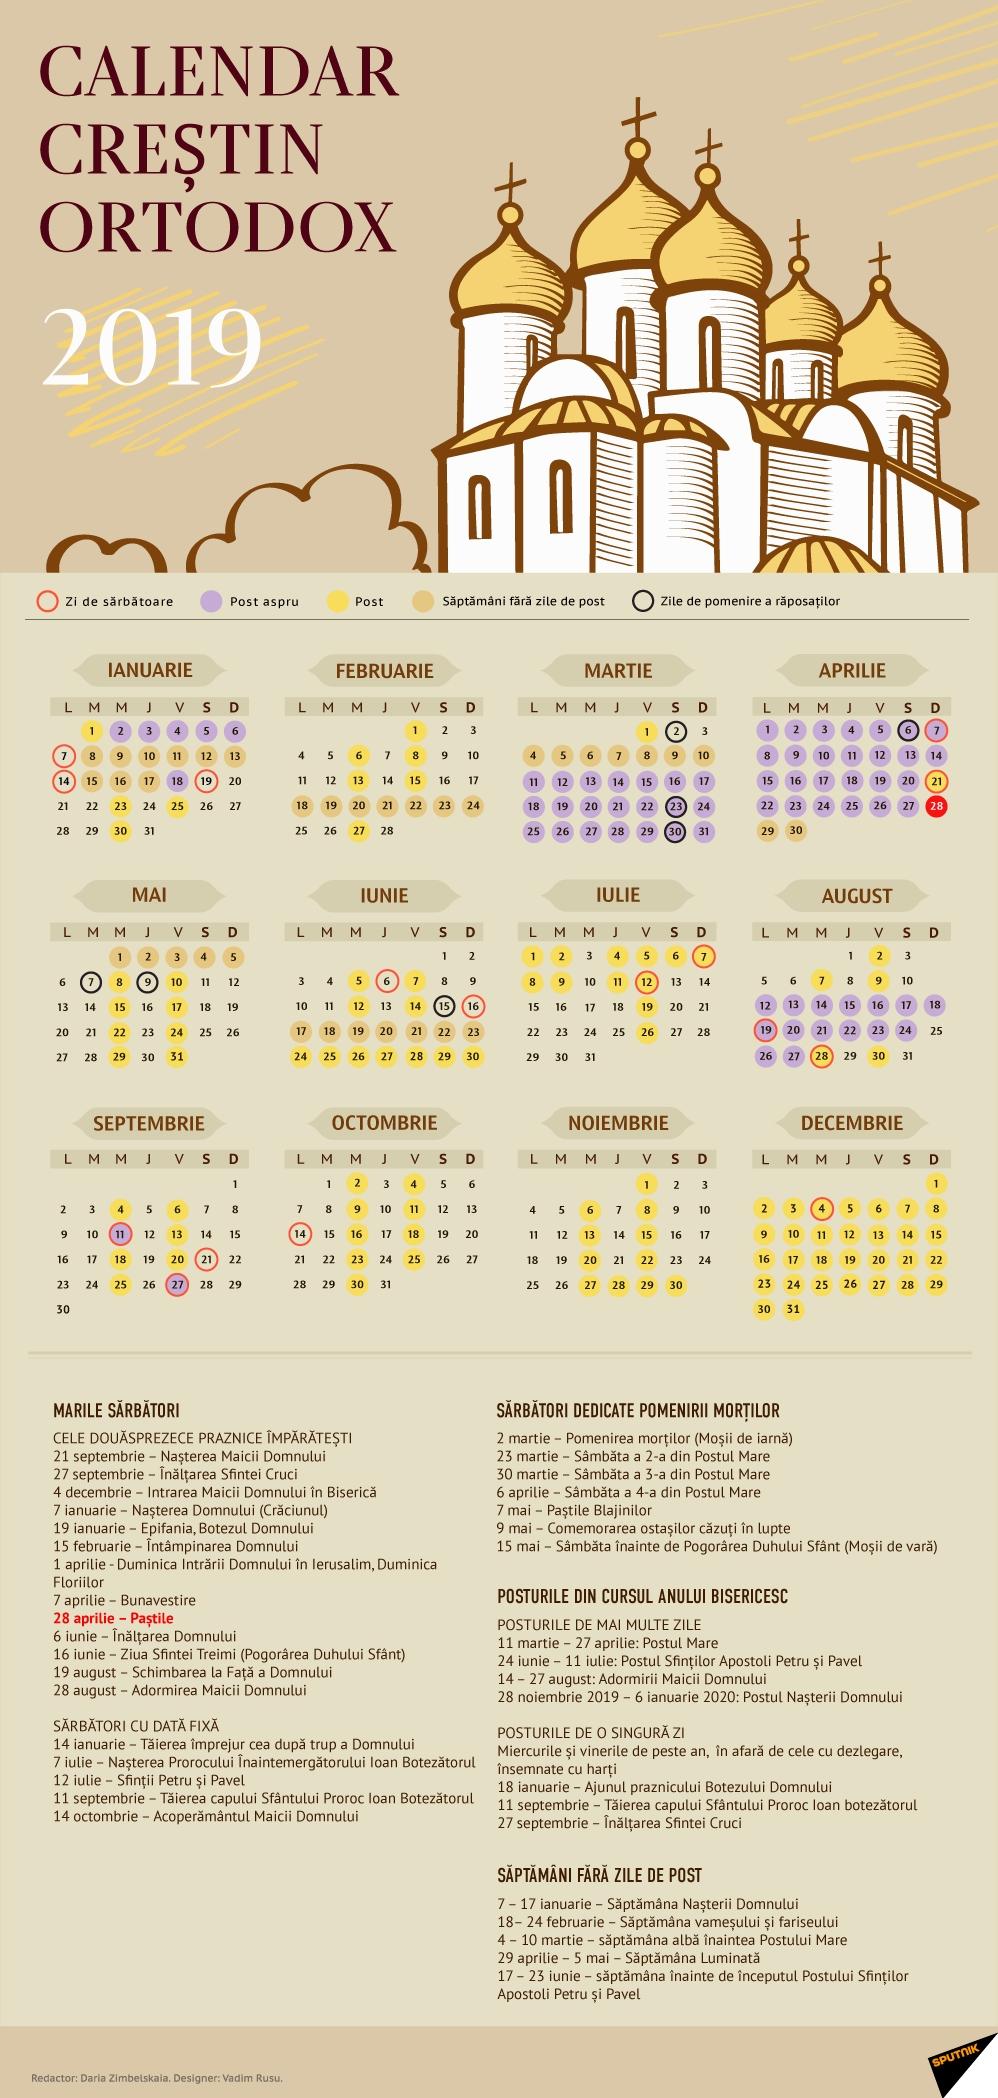 Calendar Creștin Ortodox 2019 - Stil Vechi 8 Iunie 2019 Calendar Ortodox